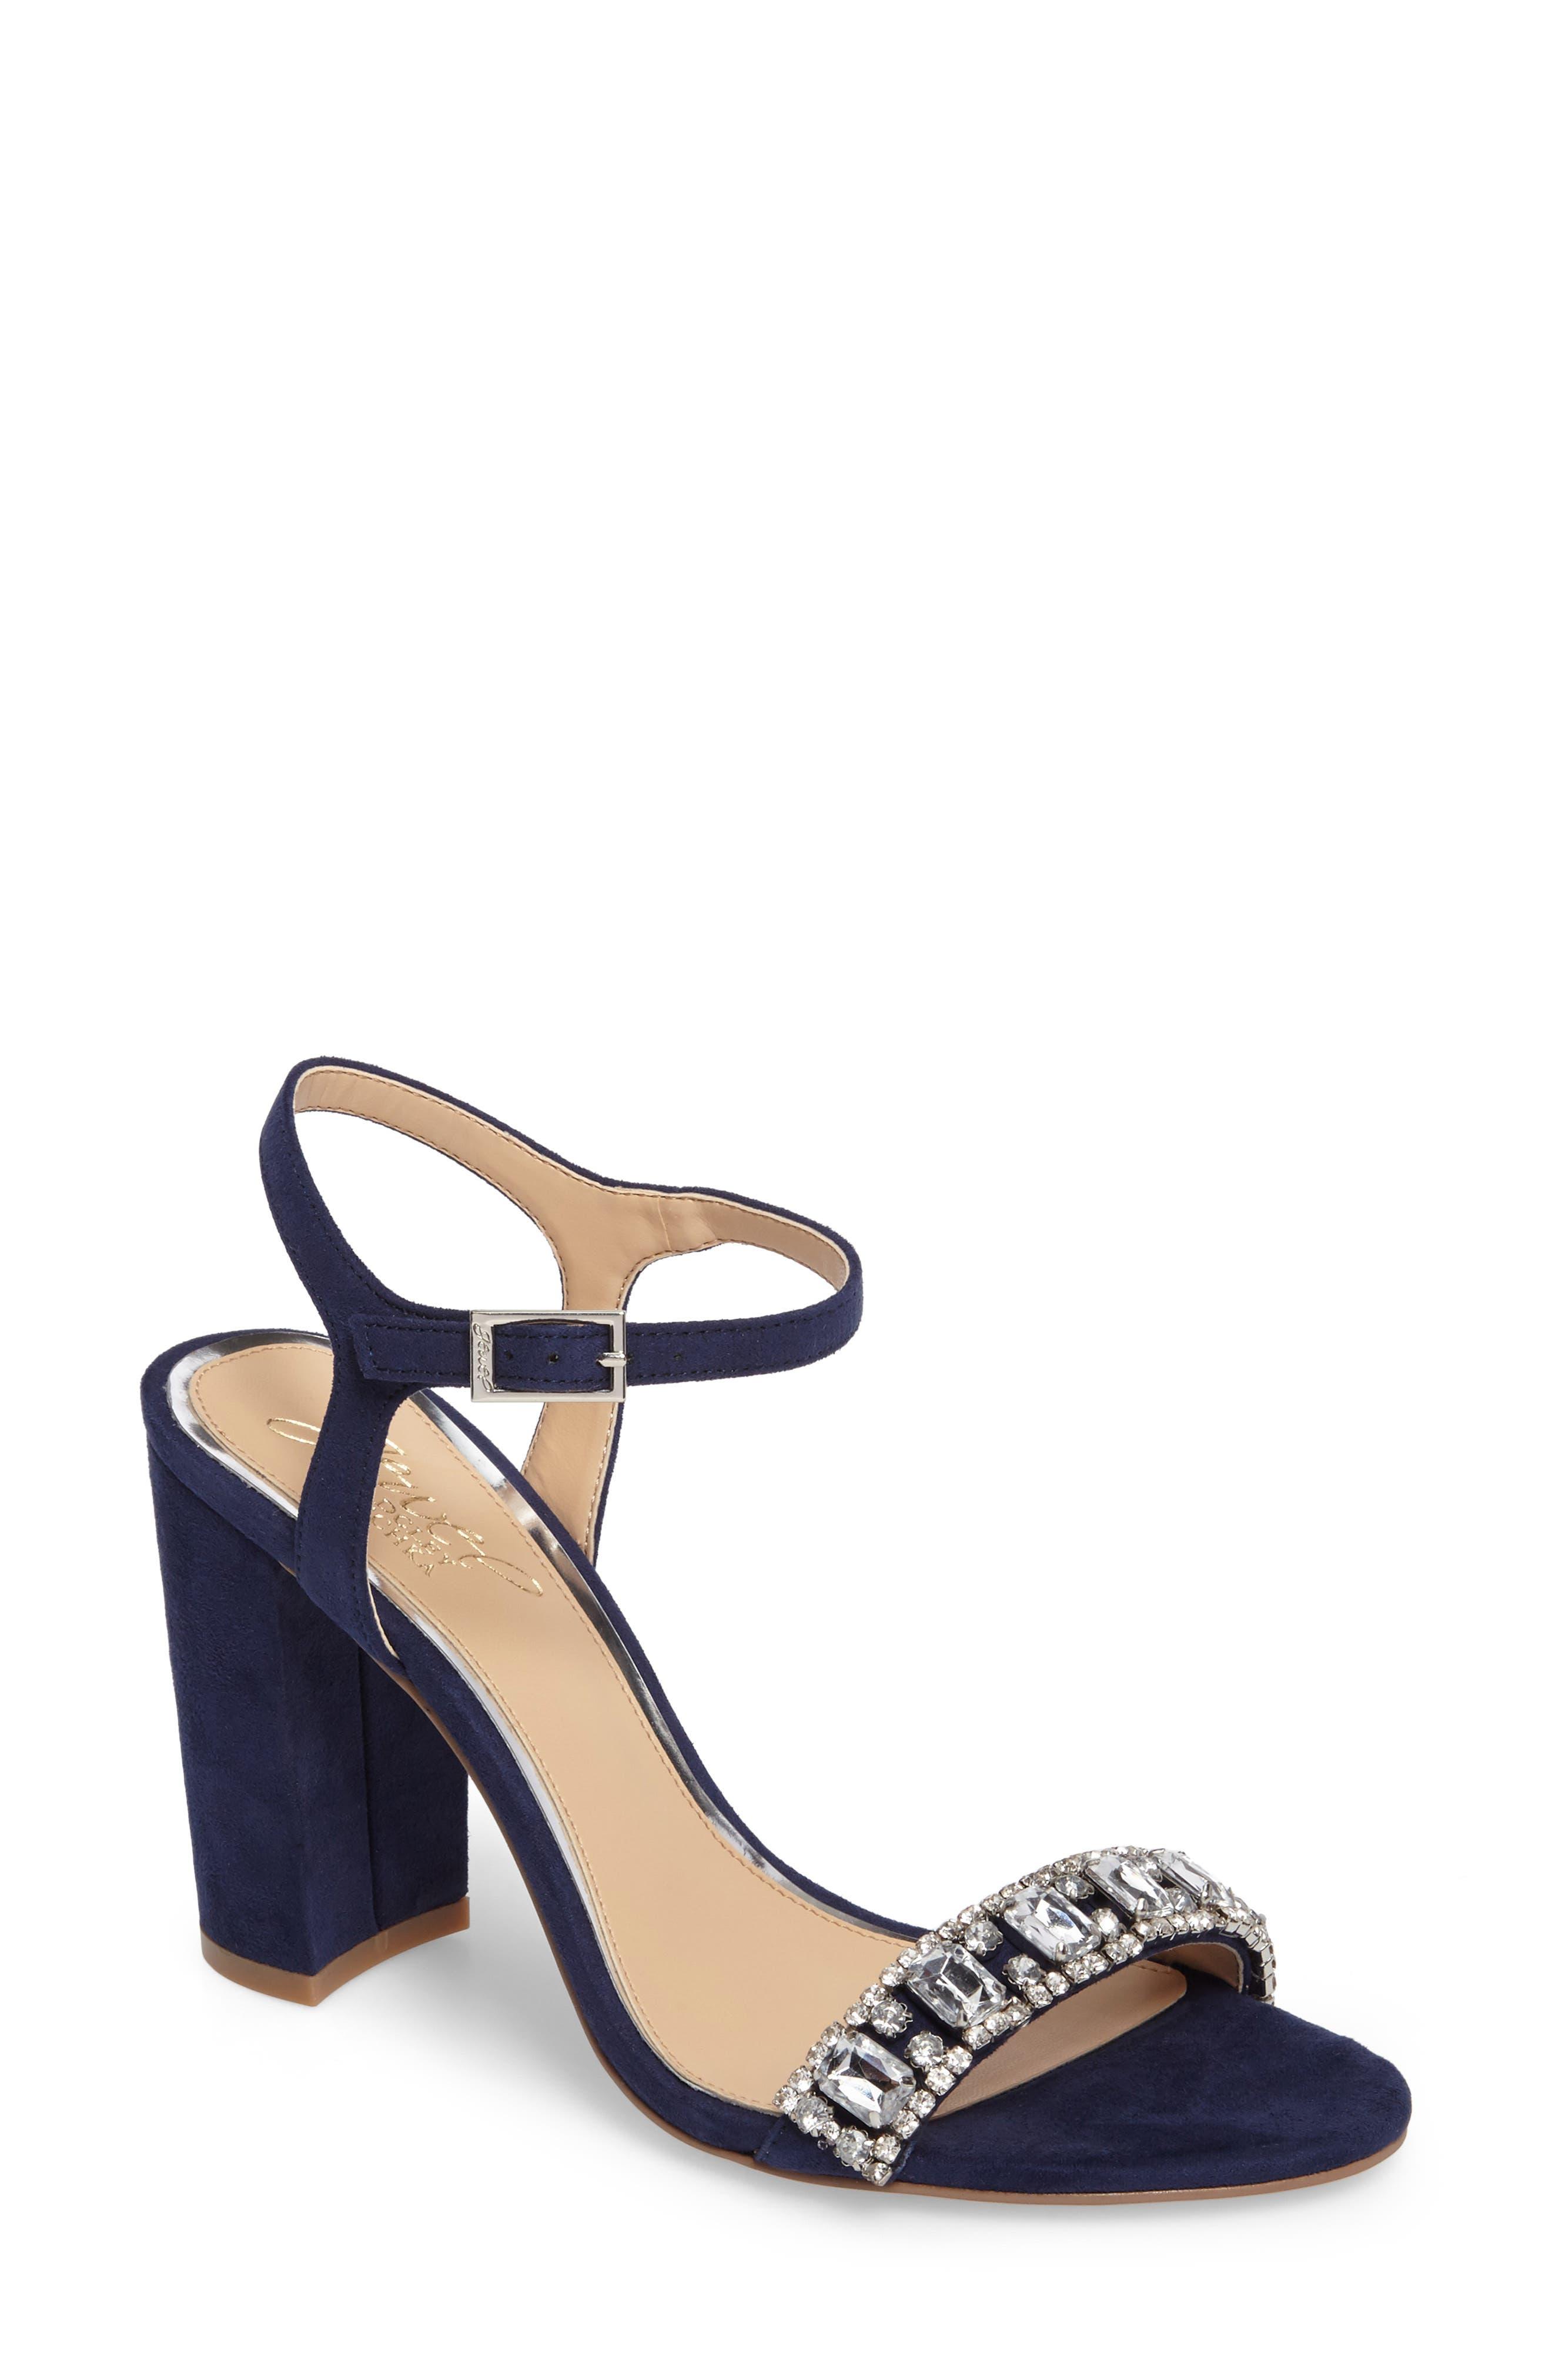 Hendricks Embellished Block Heel Sandal,                         Main,                         color, Navy Suede